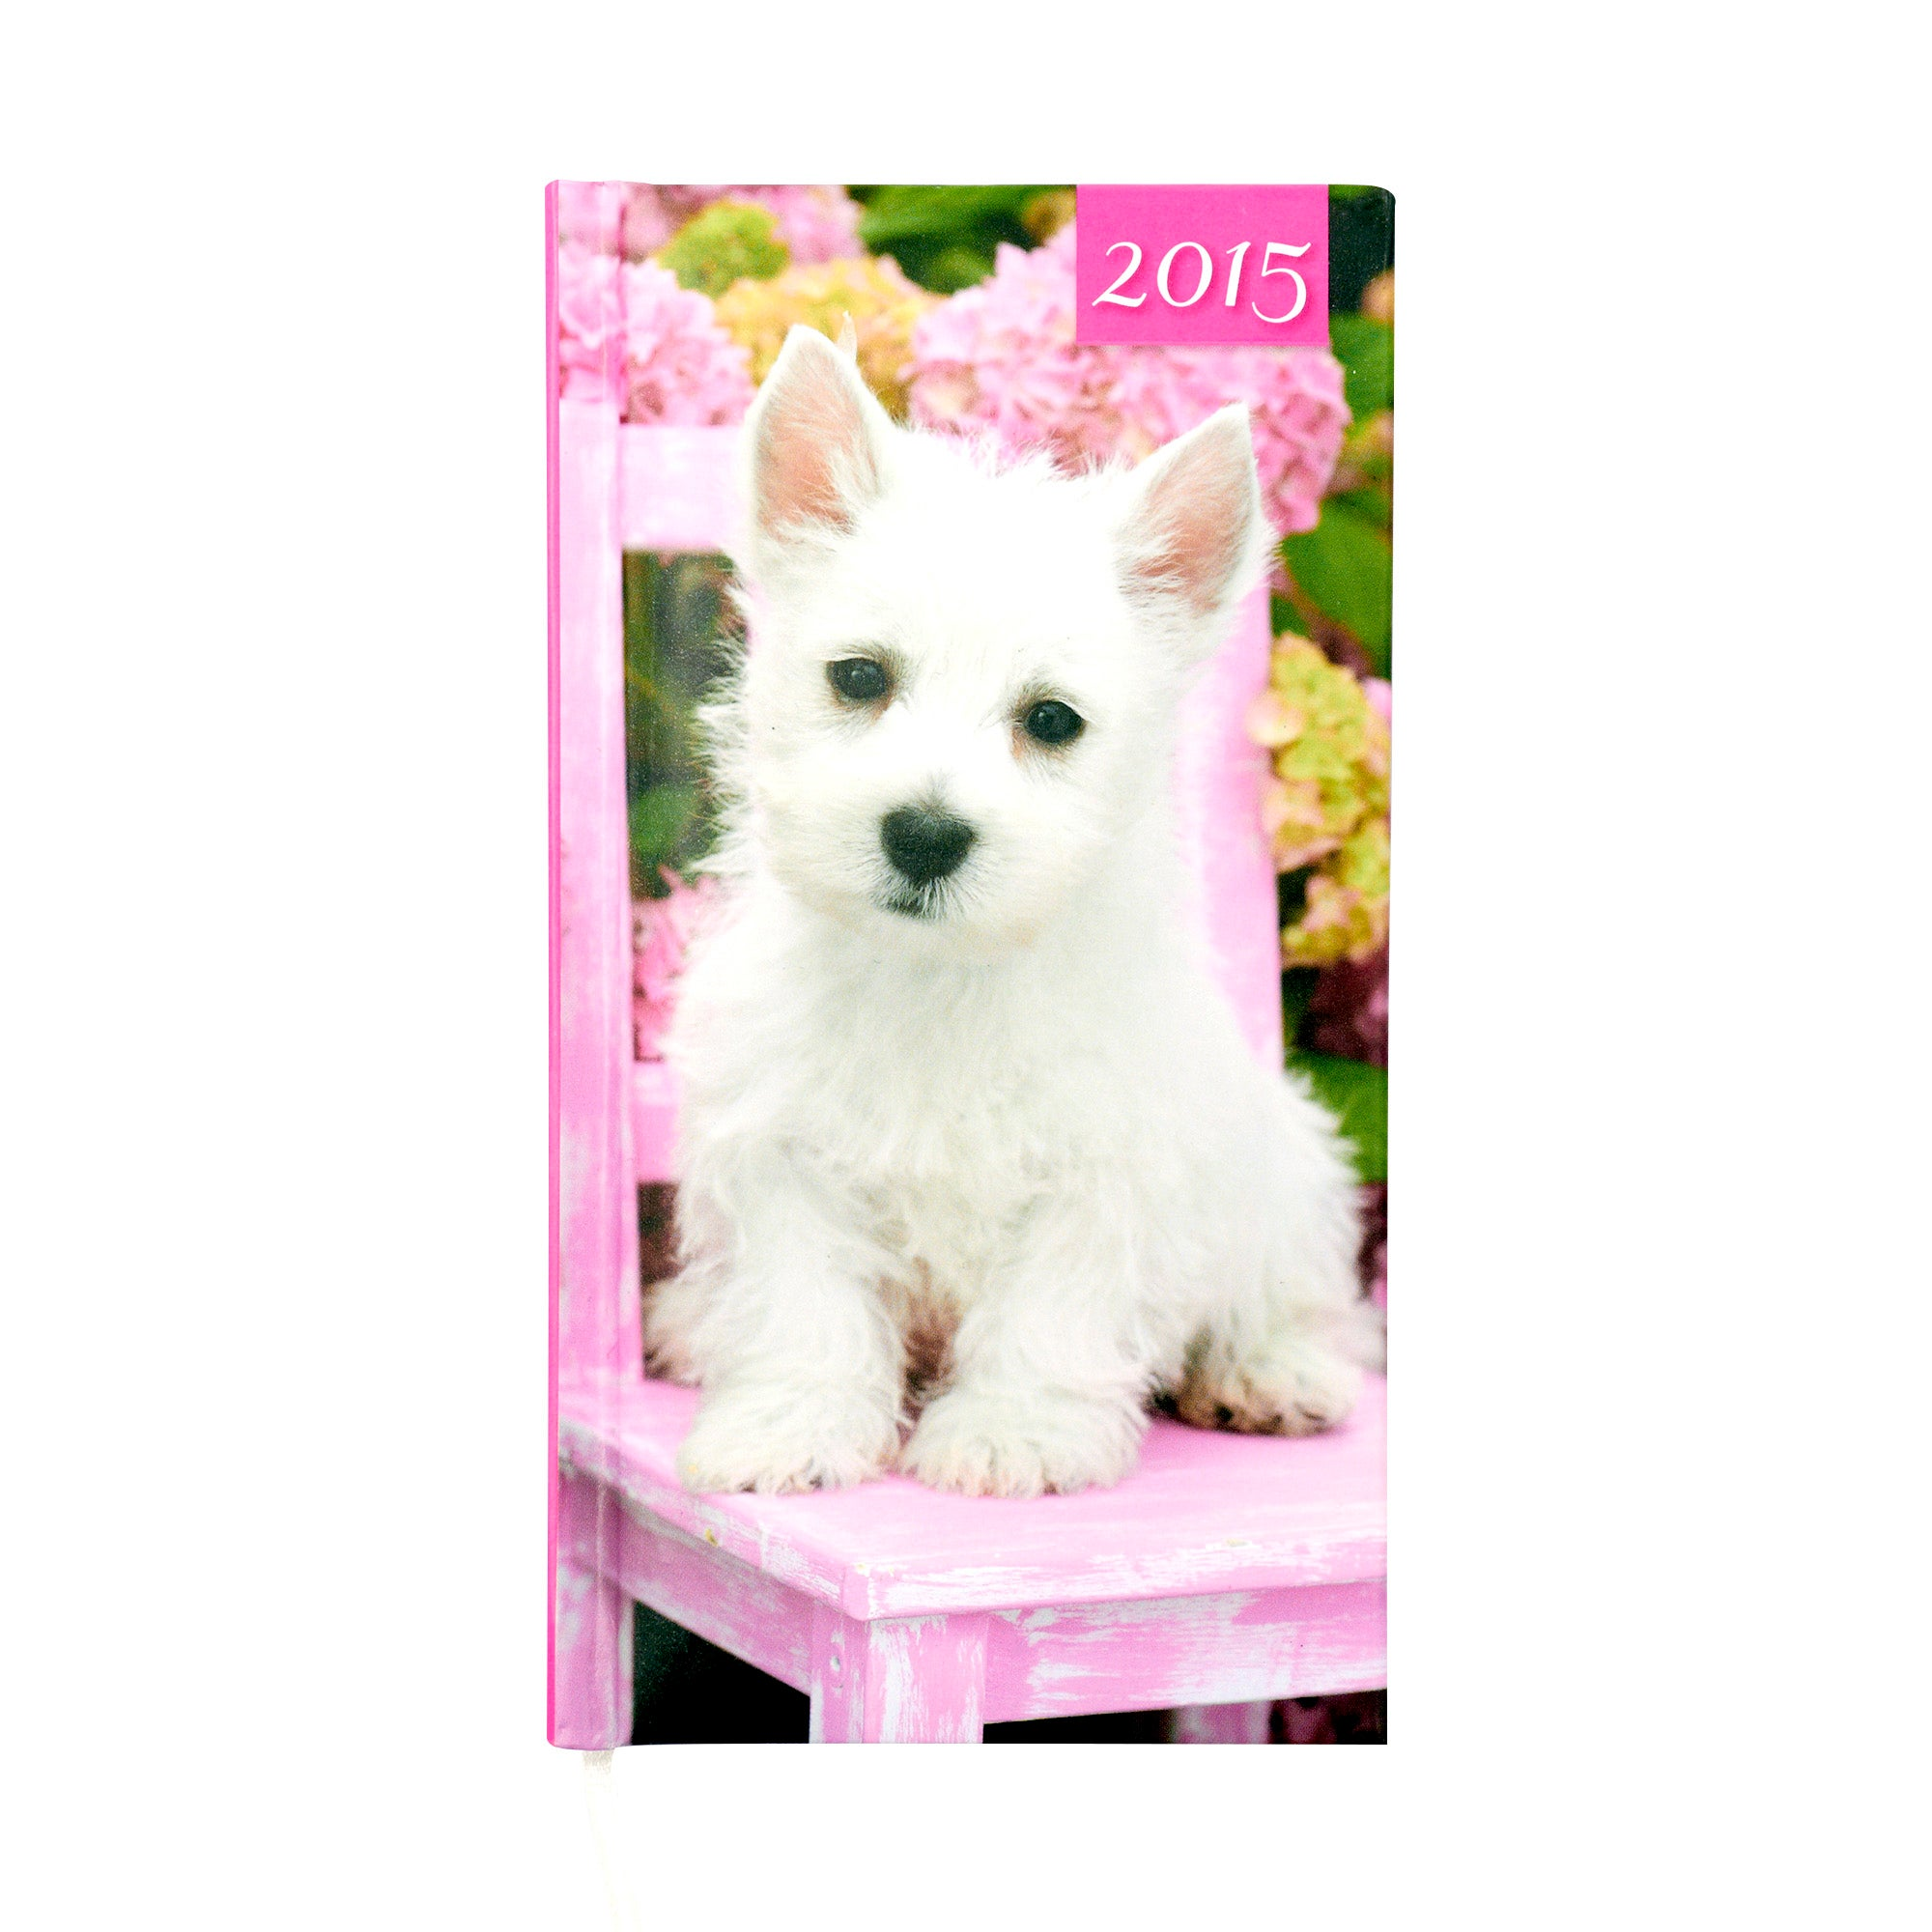 Puppy 2015 Slim Diary